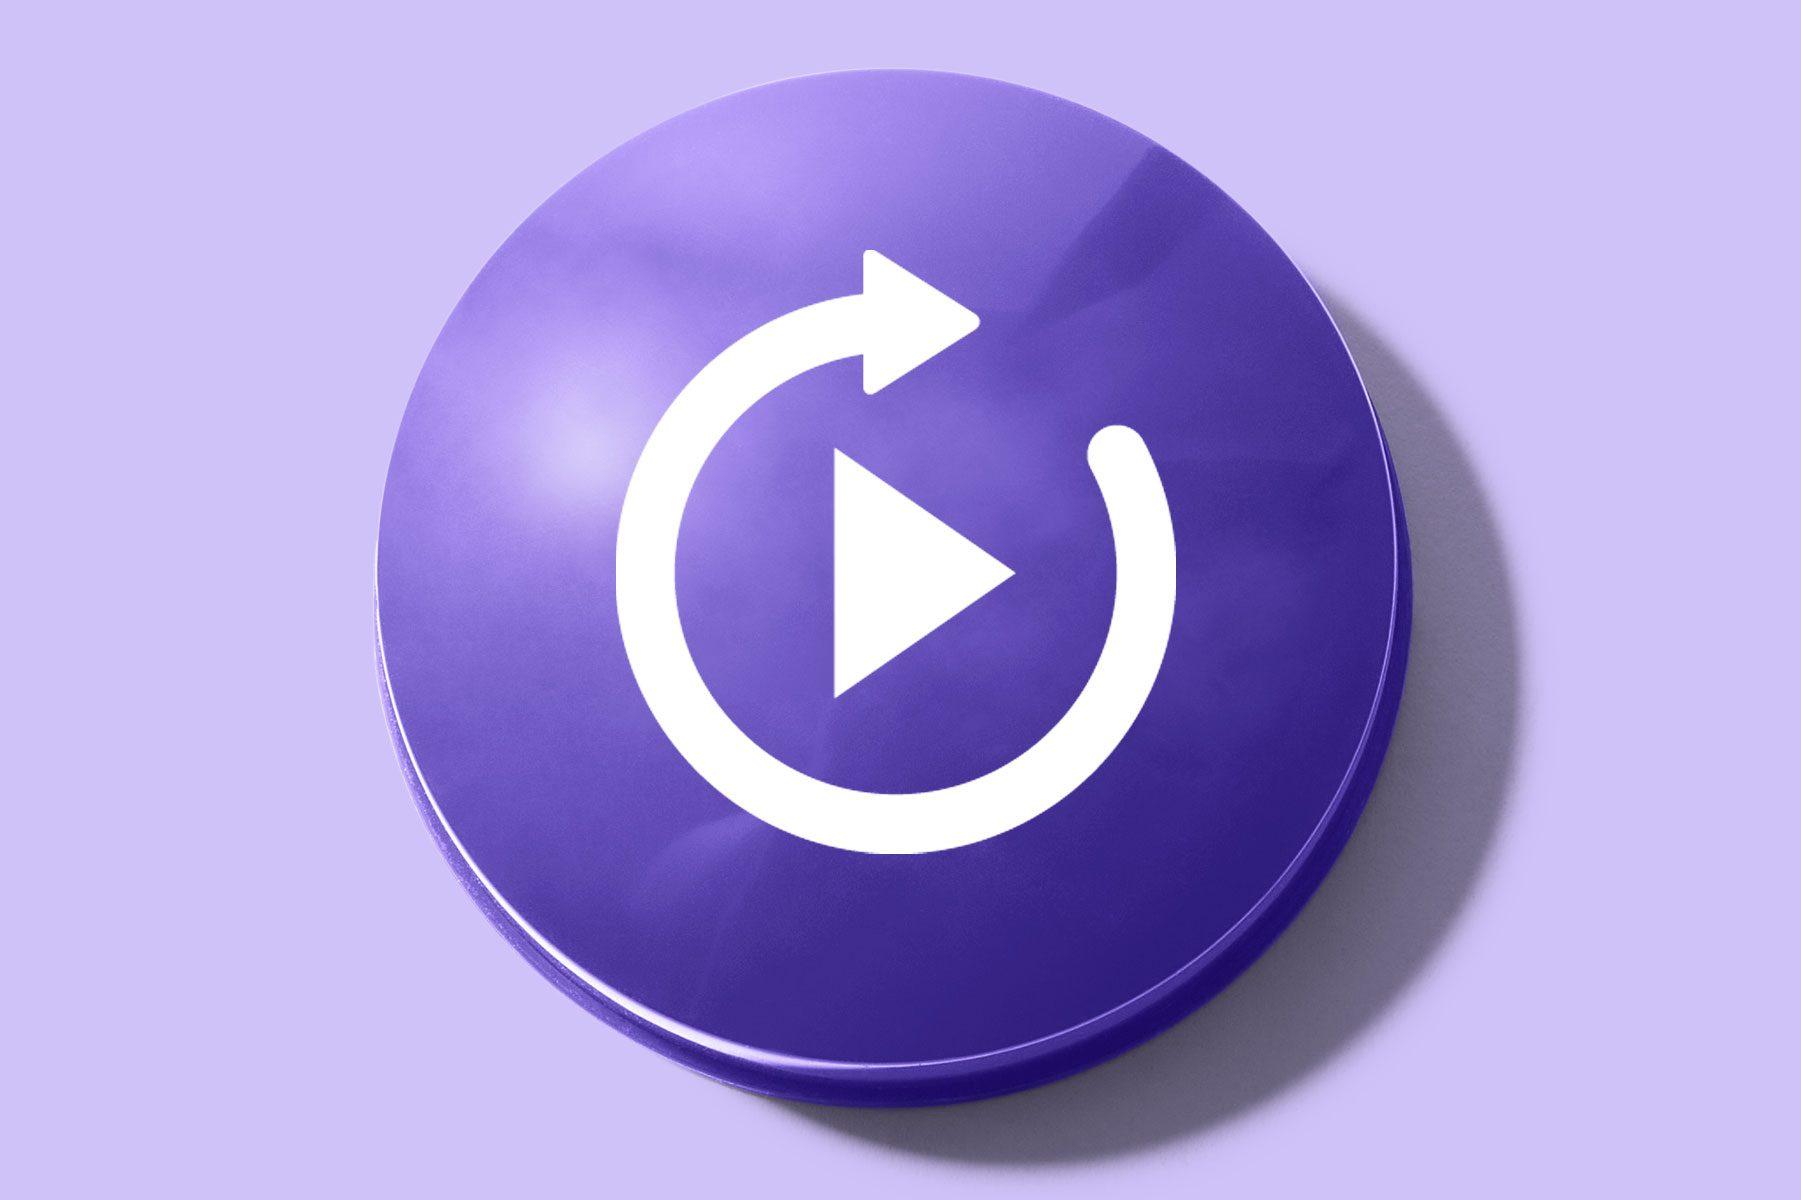 purple button with a repeat symbol